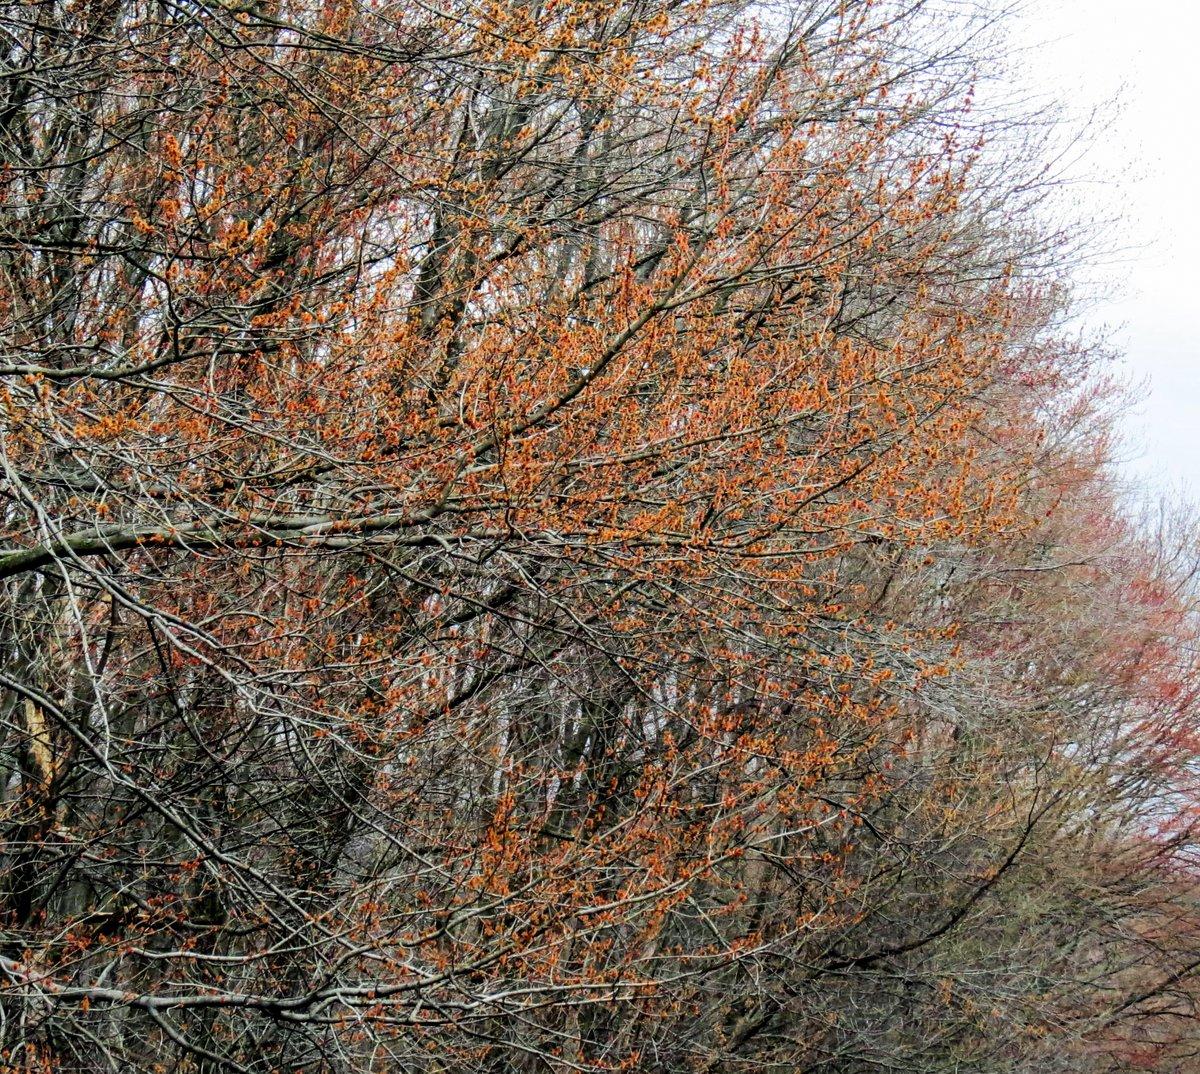 1. Red Maple Flowering